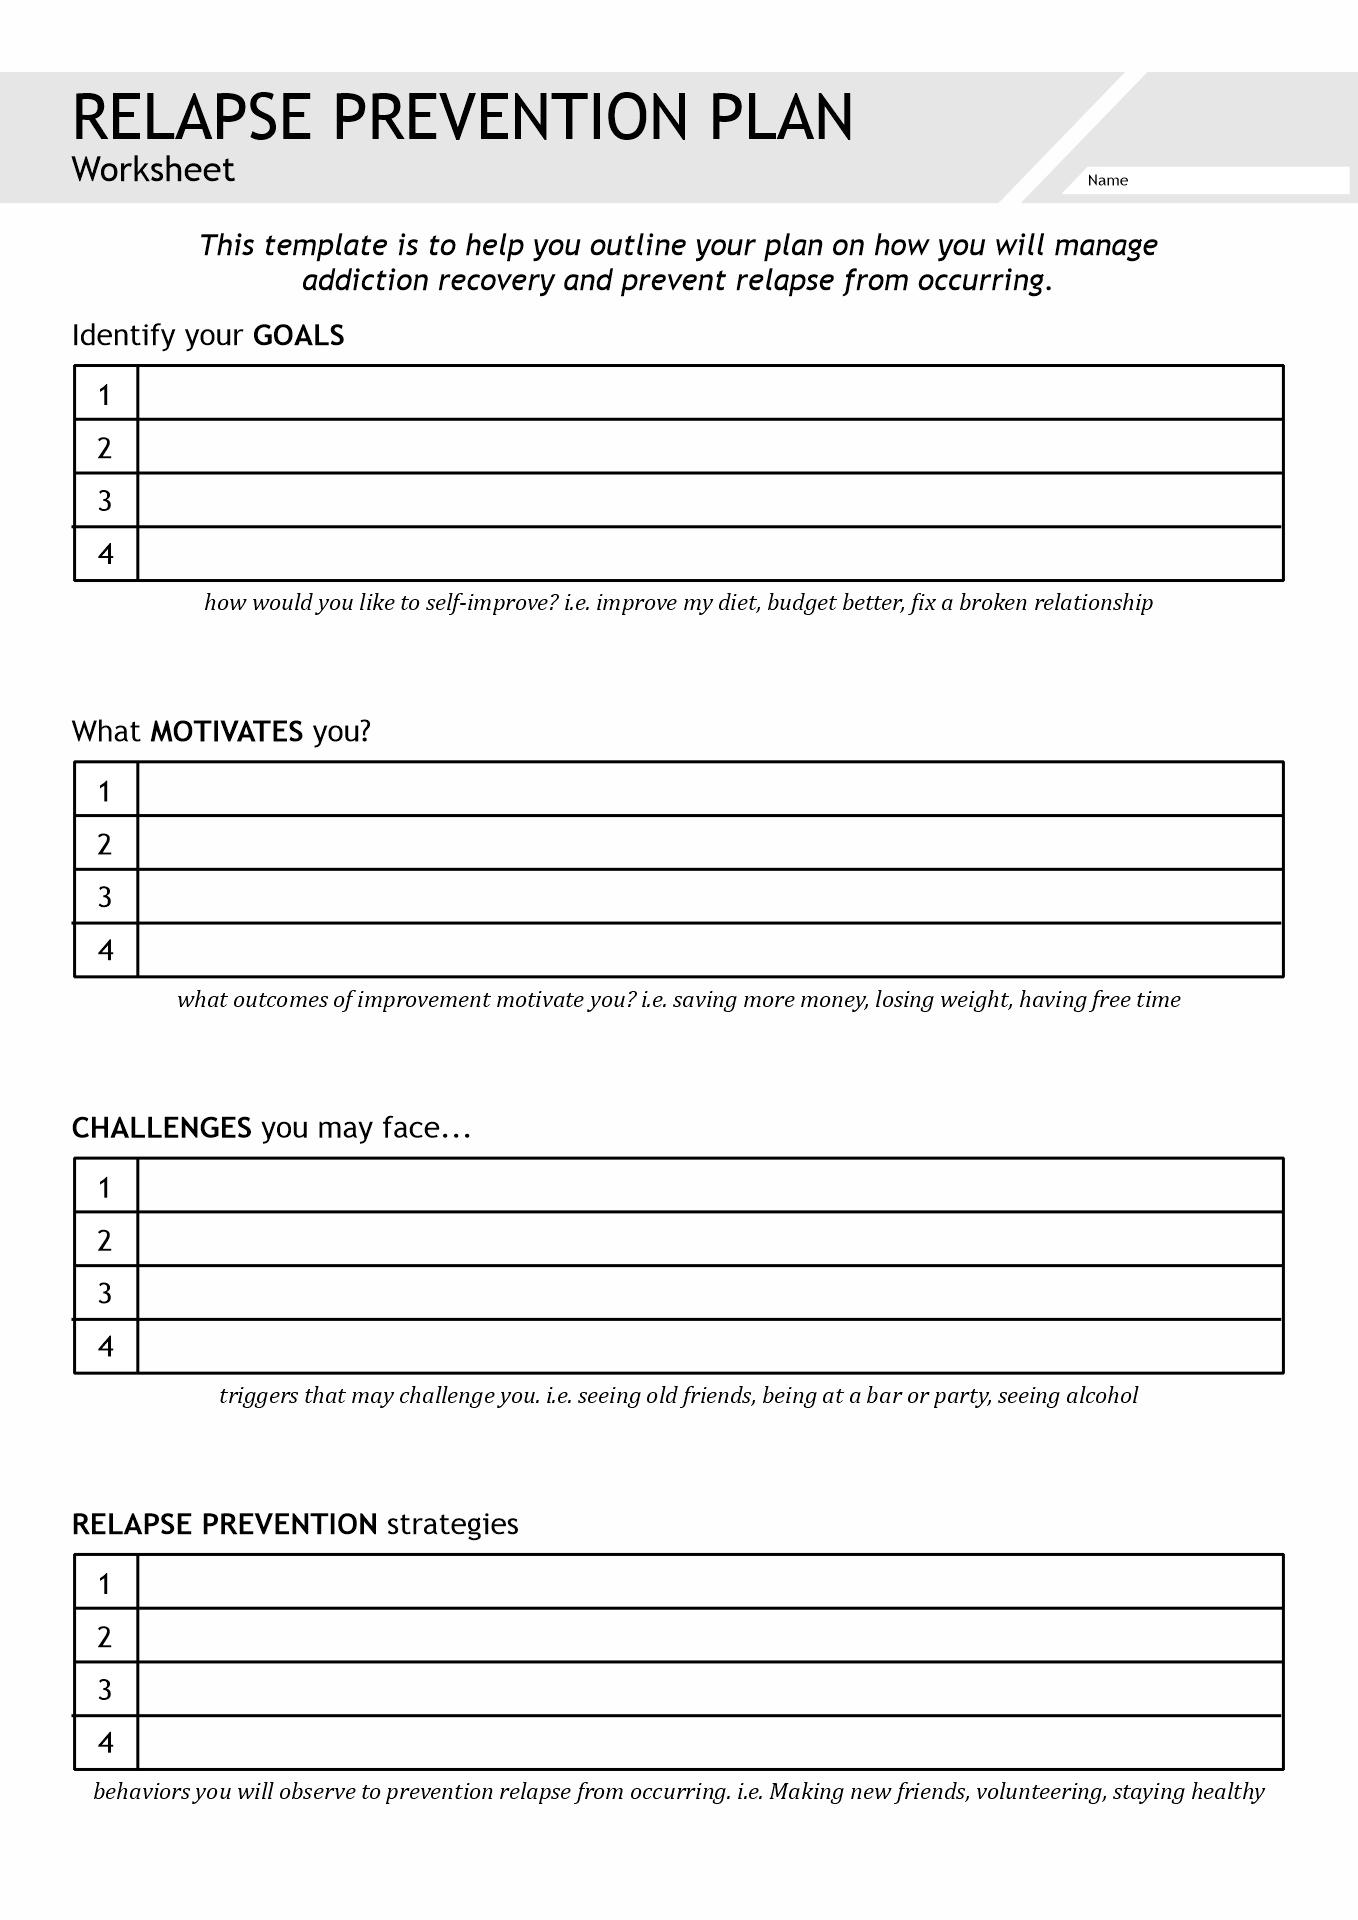 20 Best Images Of Printable Substance Abuse Worksheets